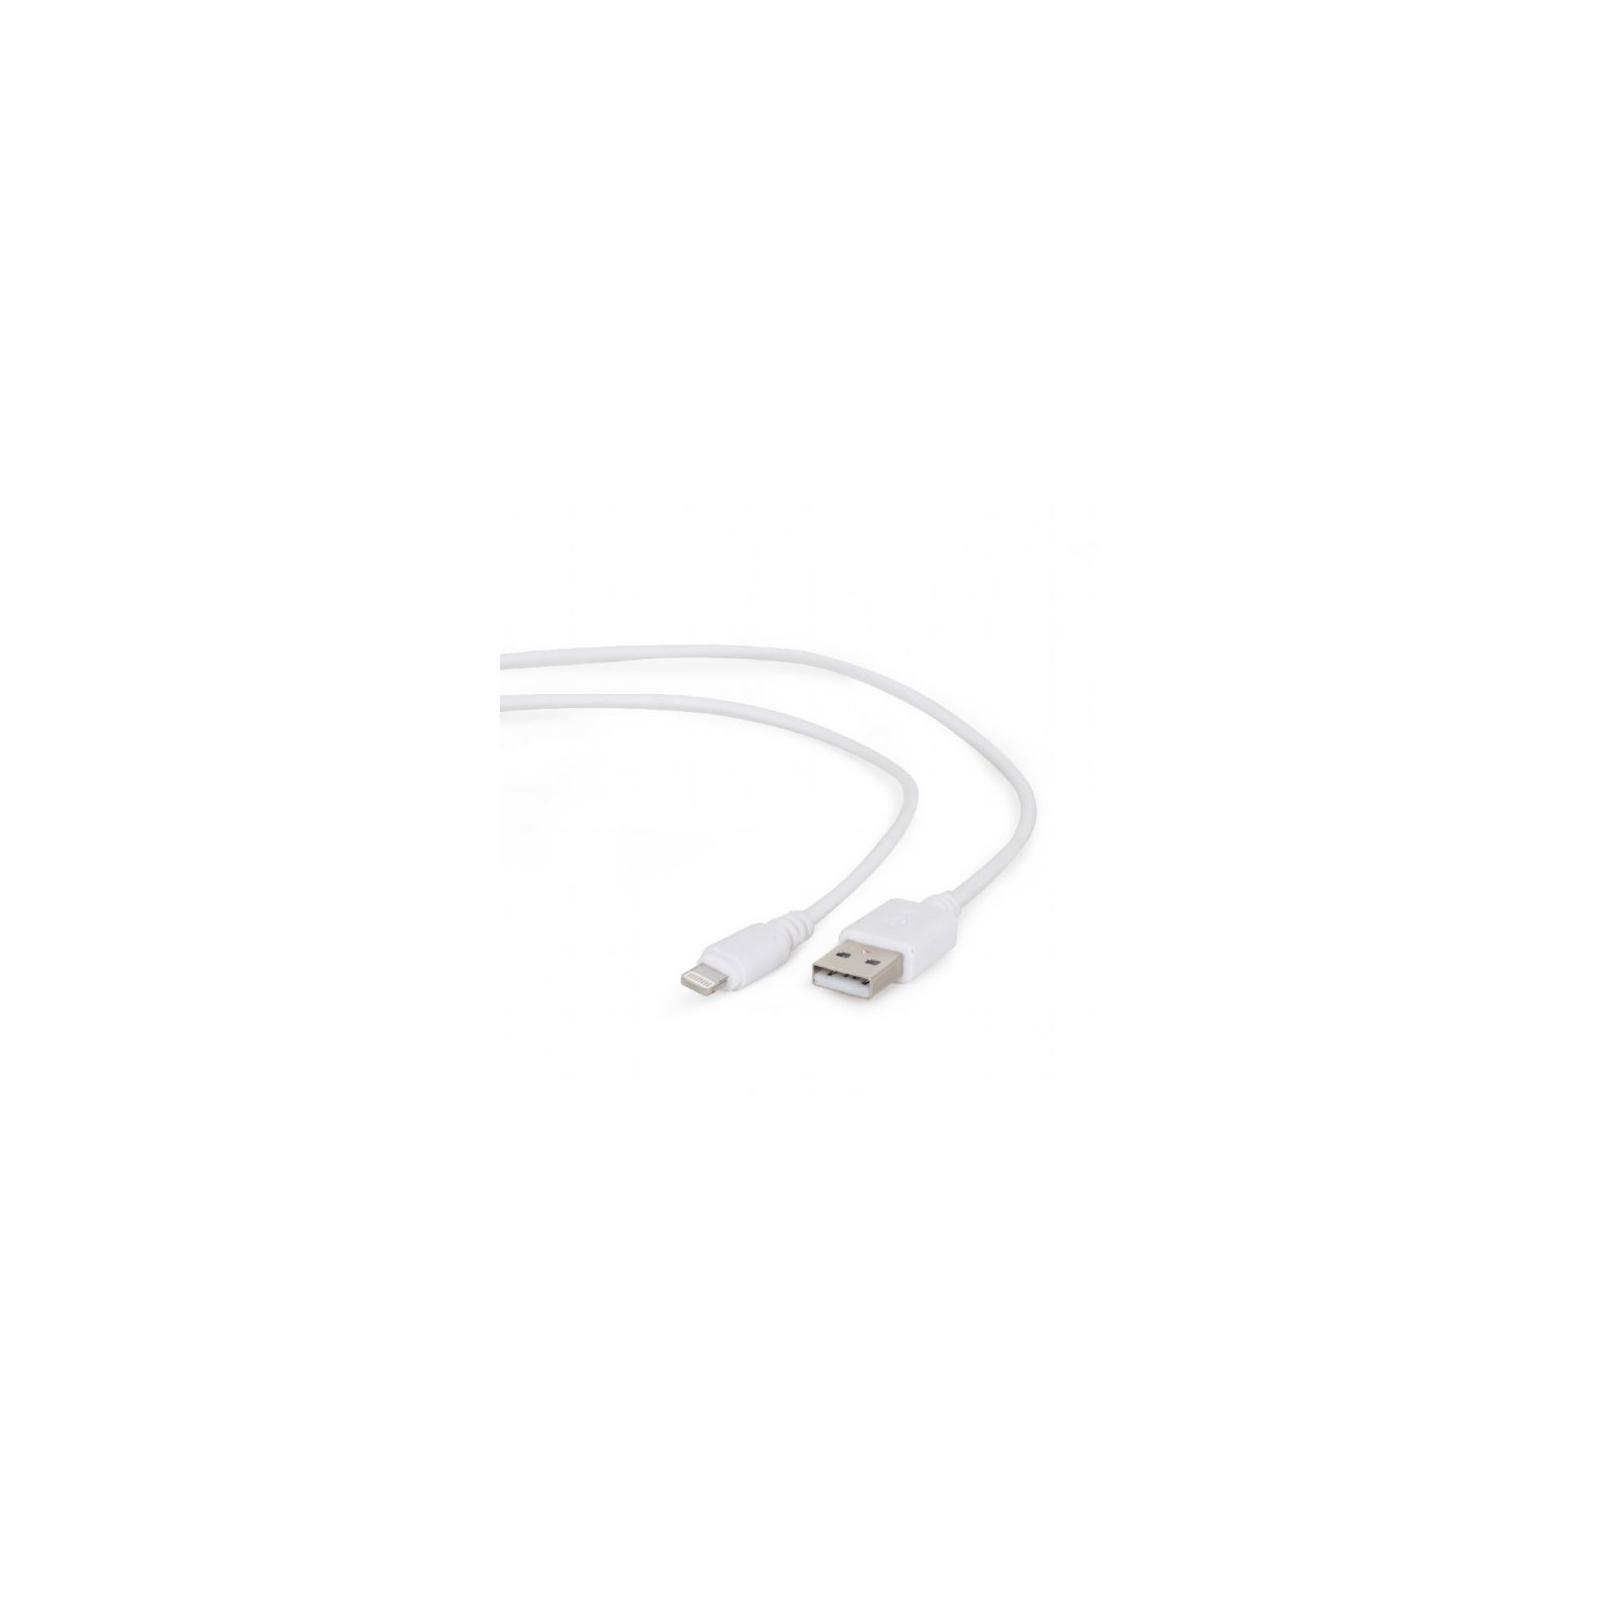 Дата кабель USB 2.0 AM to Lightning 0.1m Cablexpert (CC-USB2-AMLM-W-0.1M)